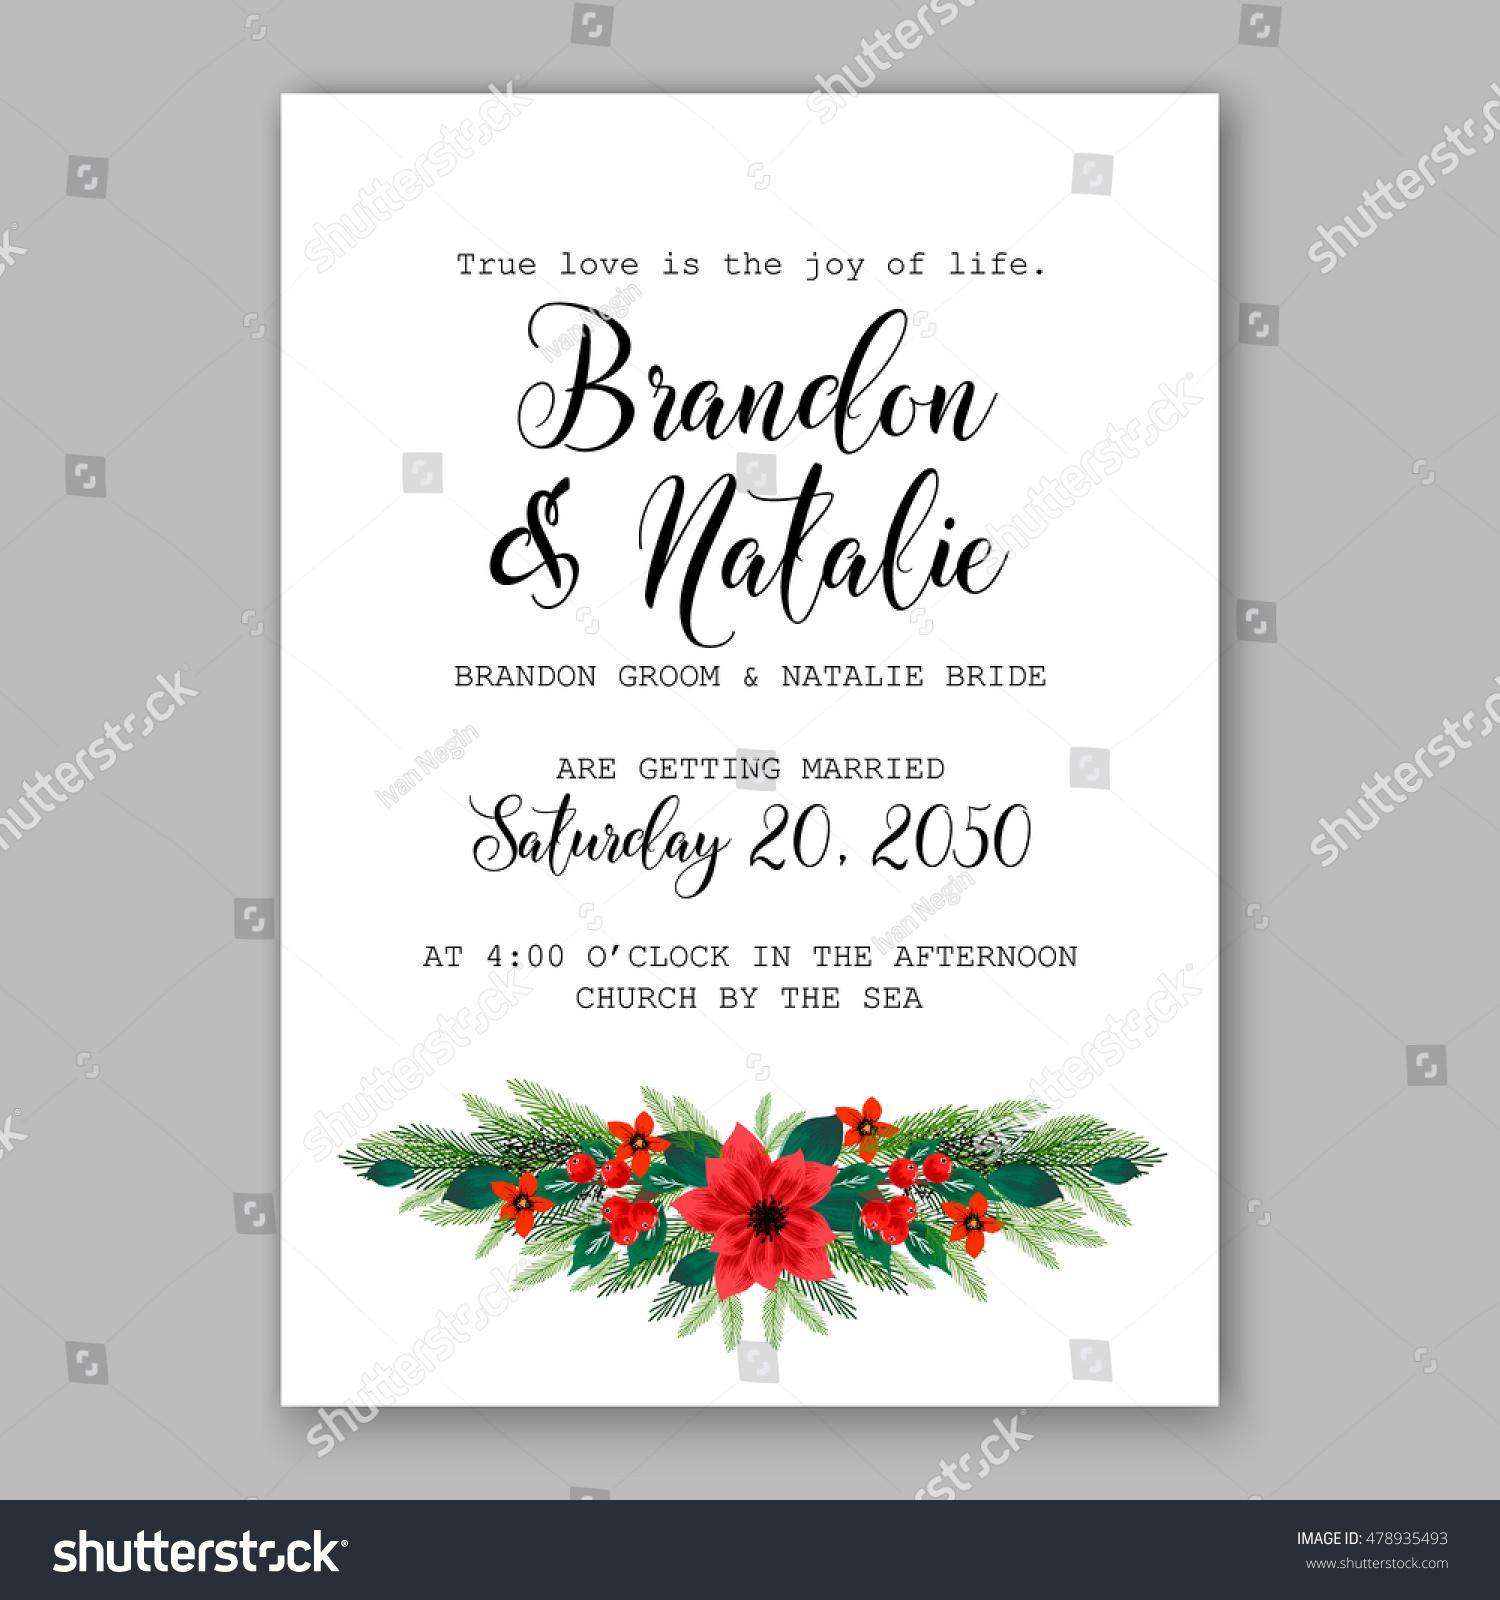 Poinsettia wedding invitation sample card beautiful stock vector poinsettia wedding invitation sample card beautiful winter floral ornament christmas party wreath poinsettia pine branch stopboris Images